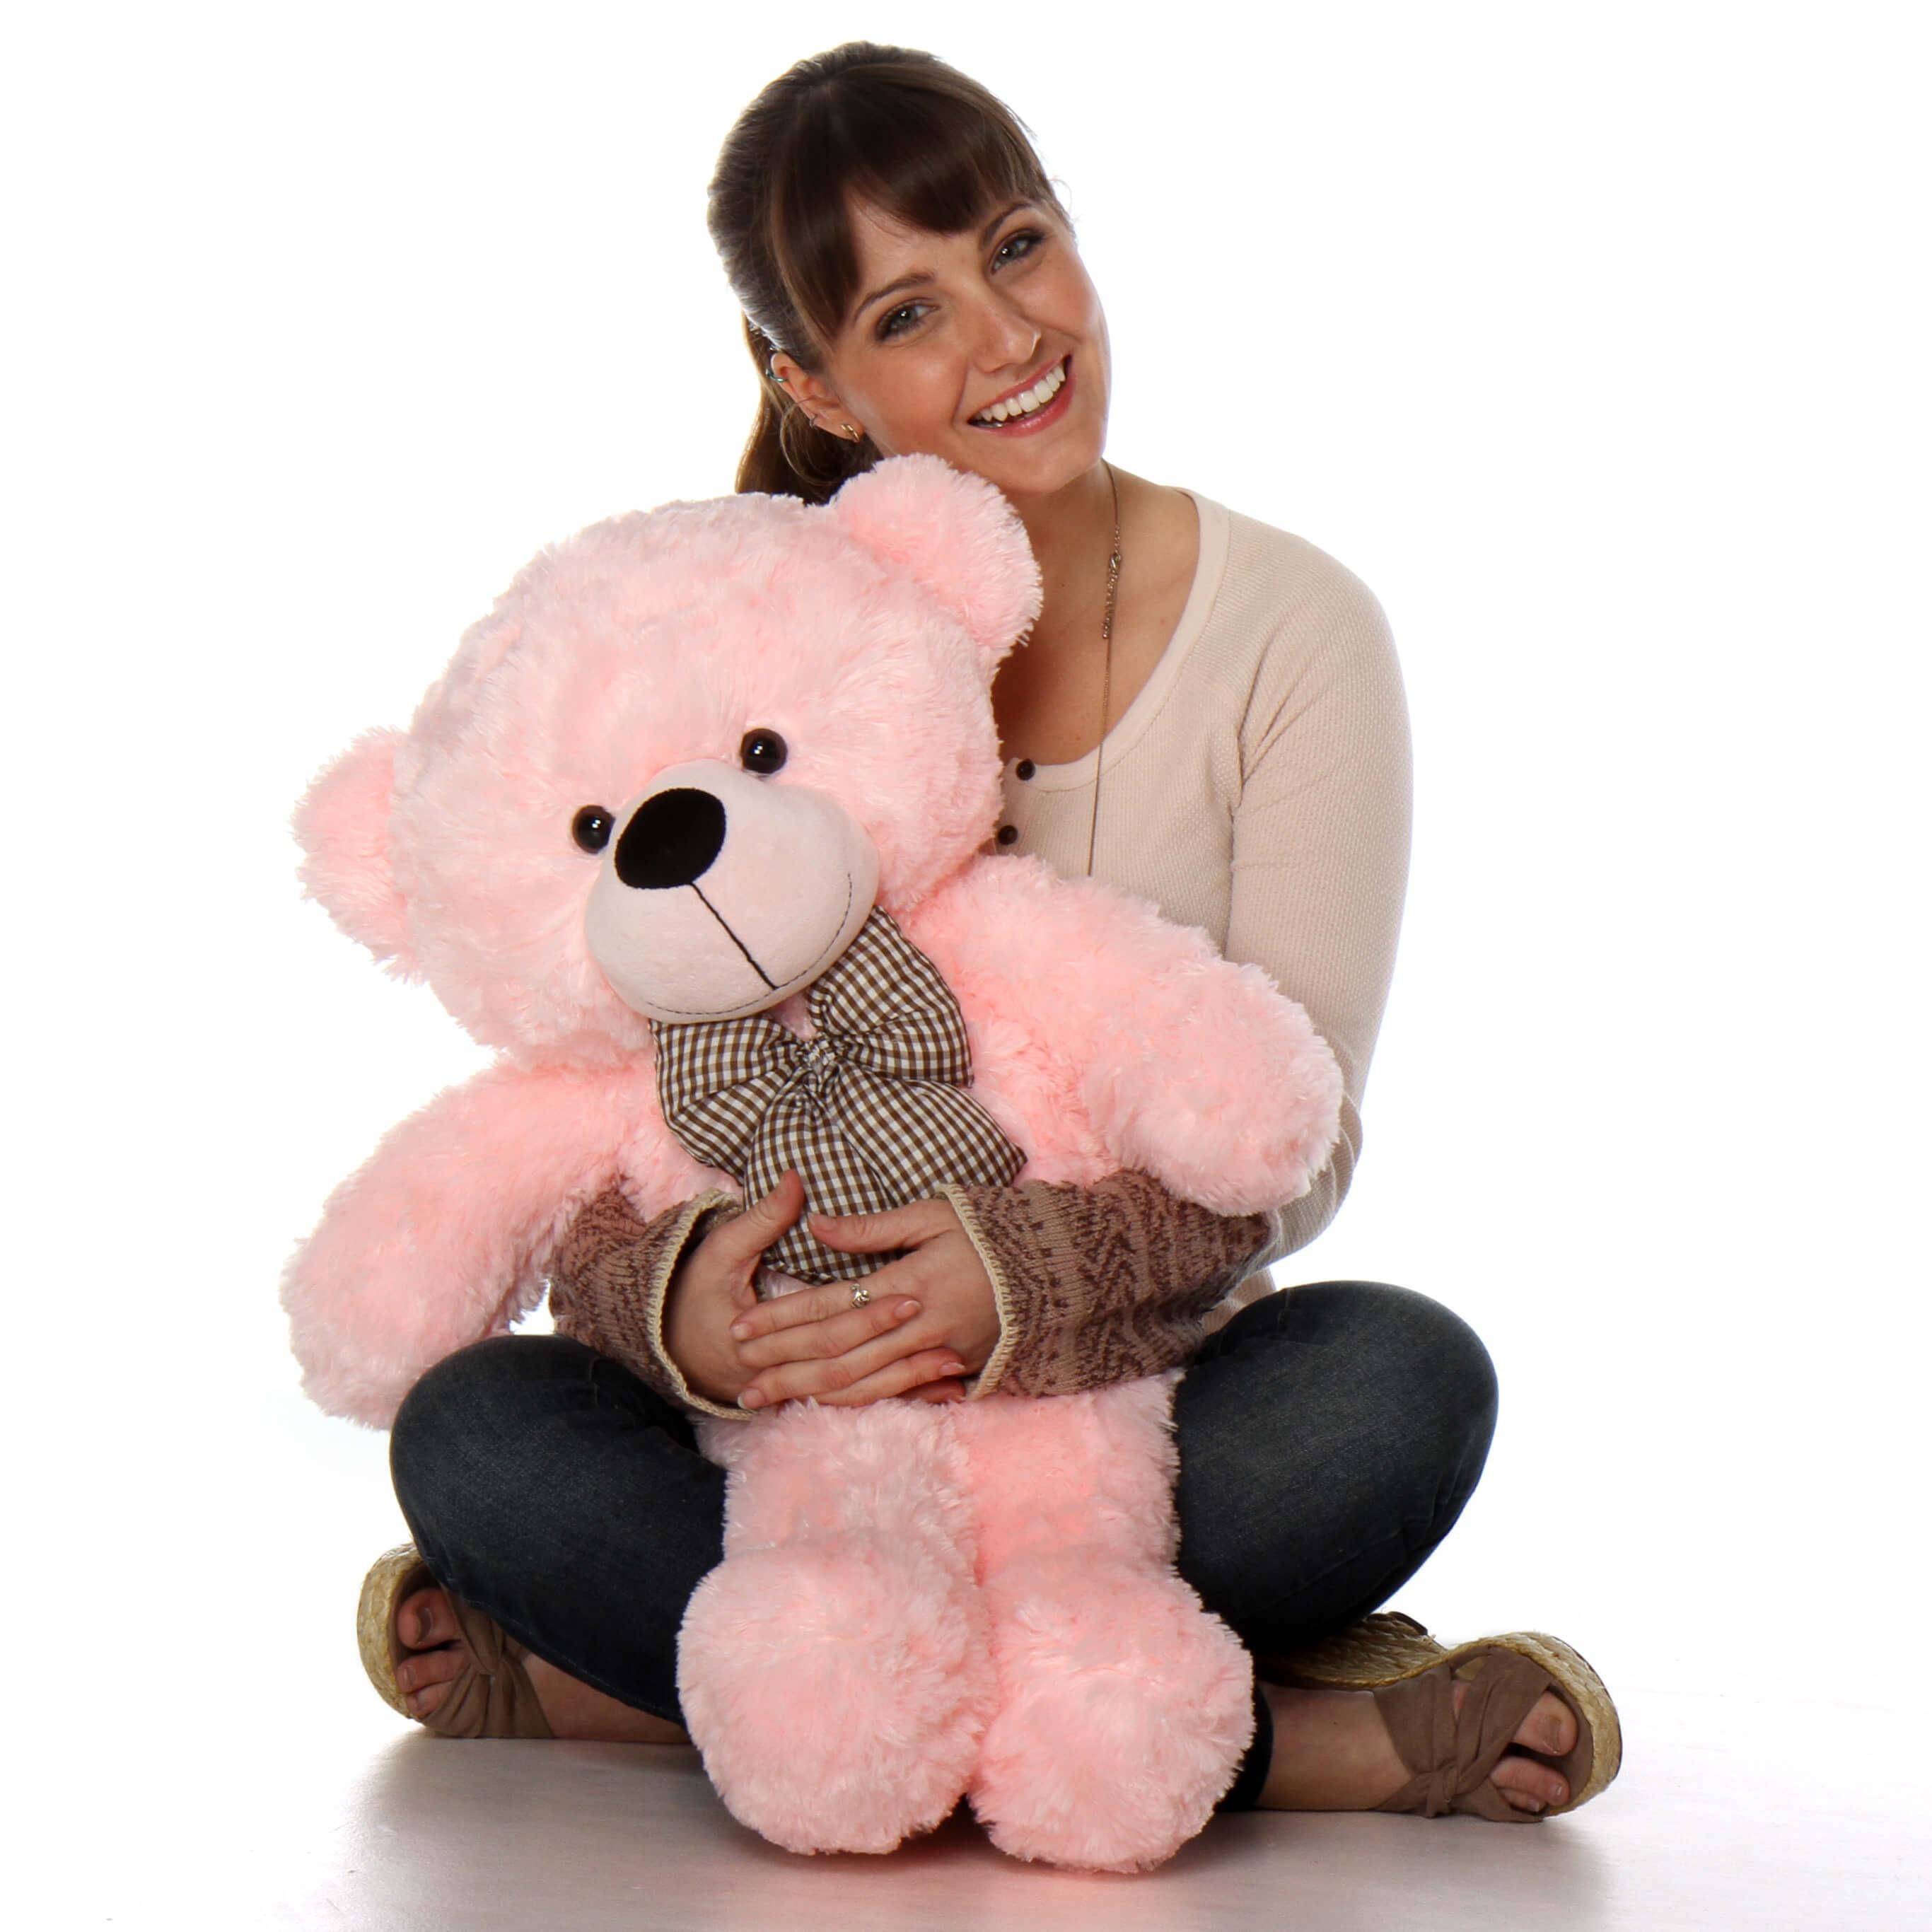 30in-lady-cuddles-huggable-soft-huggable-pink-giant-teddy-plush-bear1.jpg